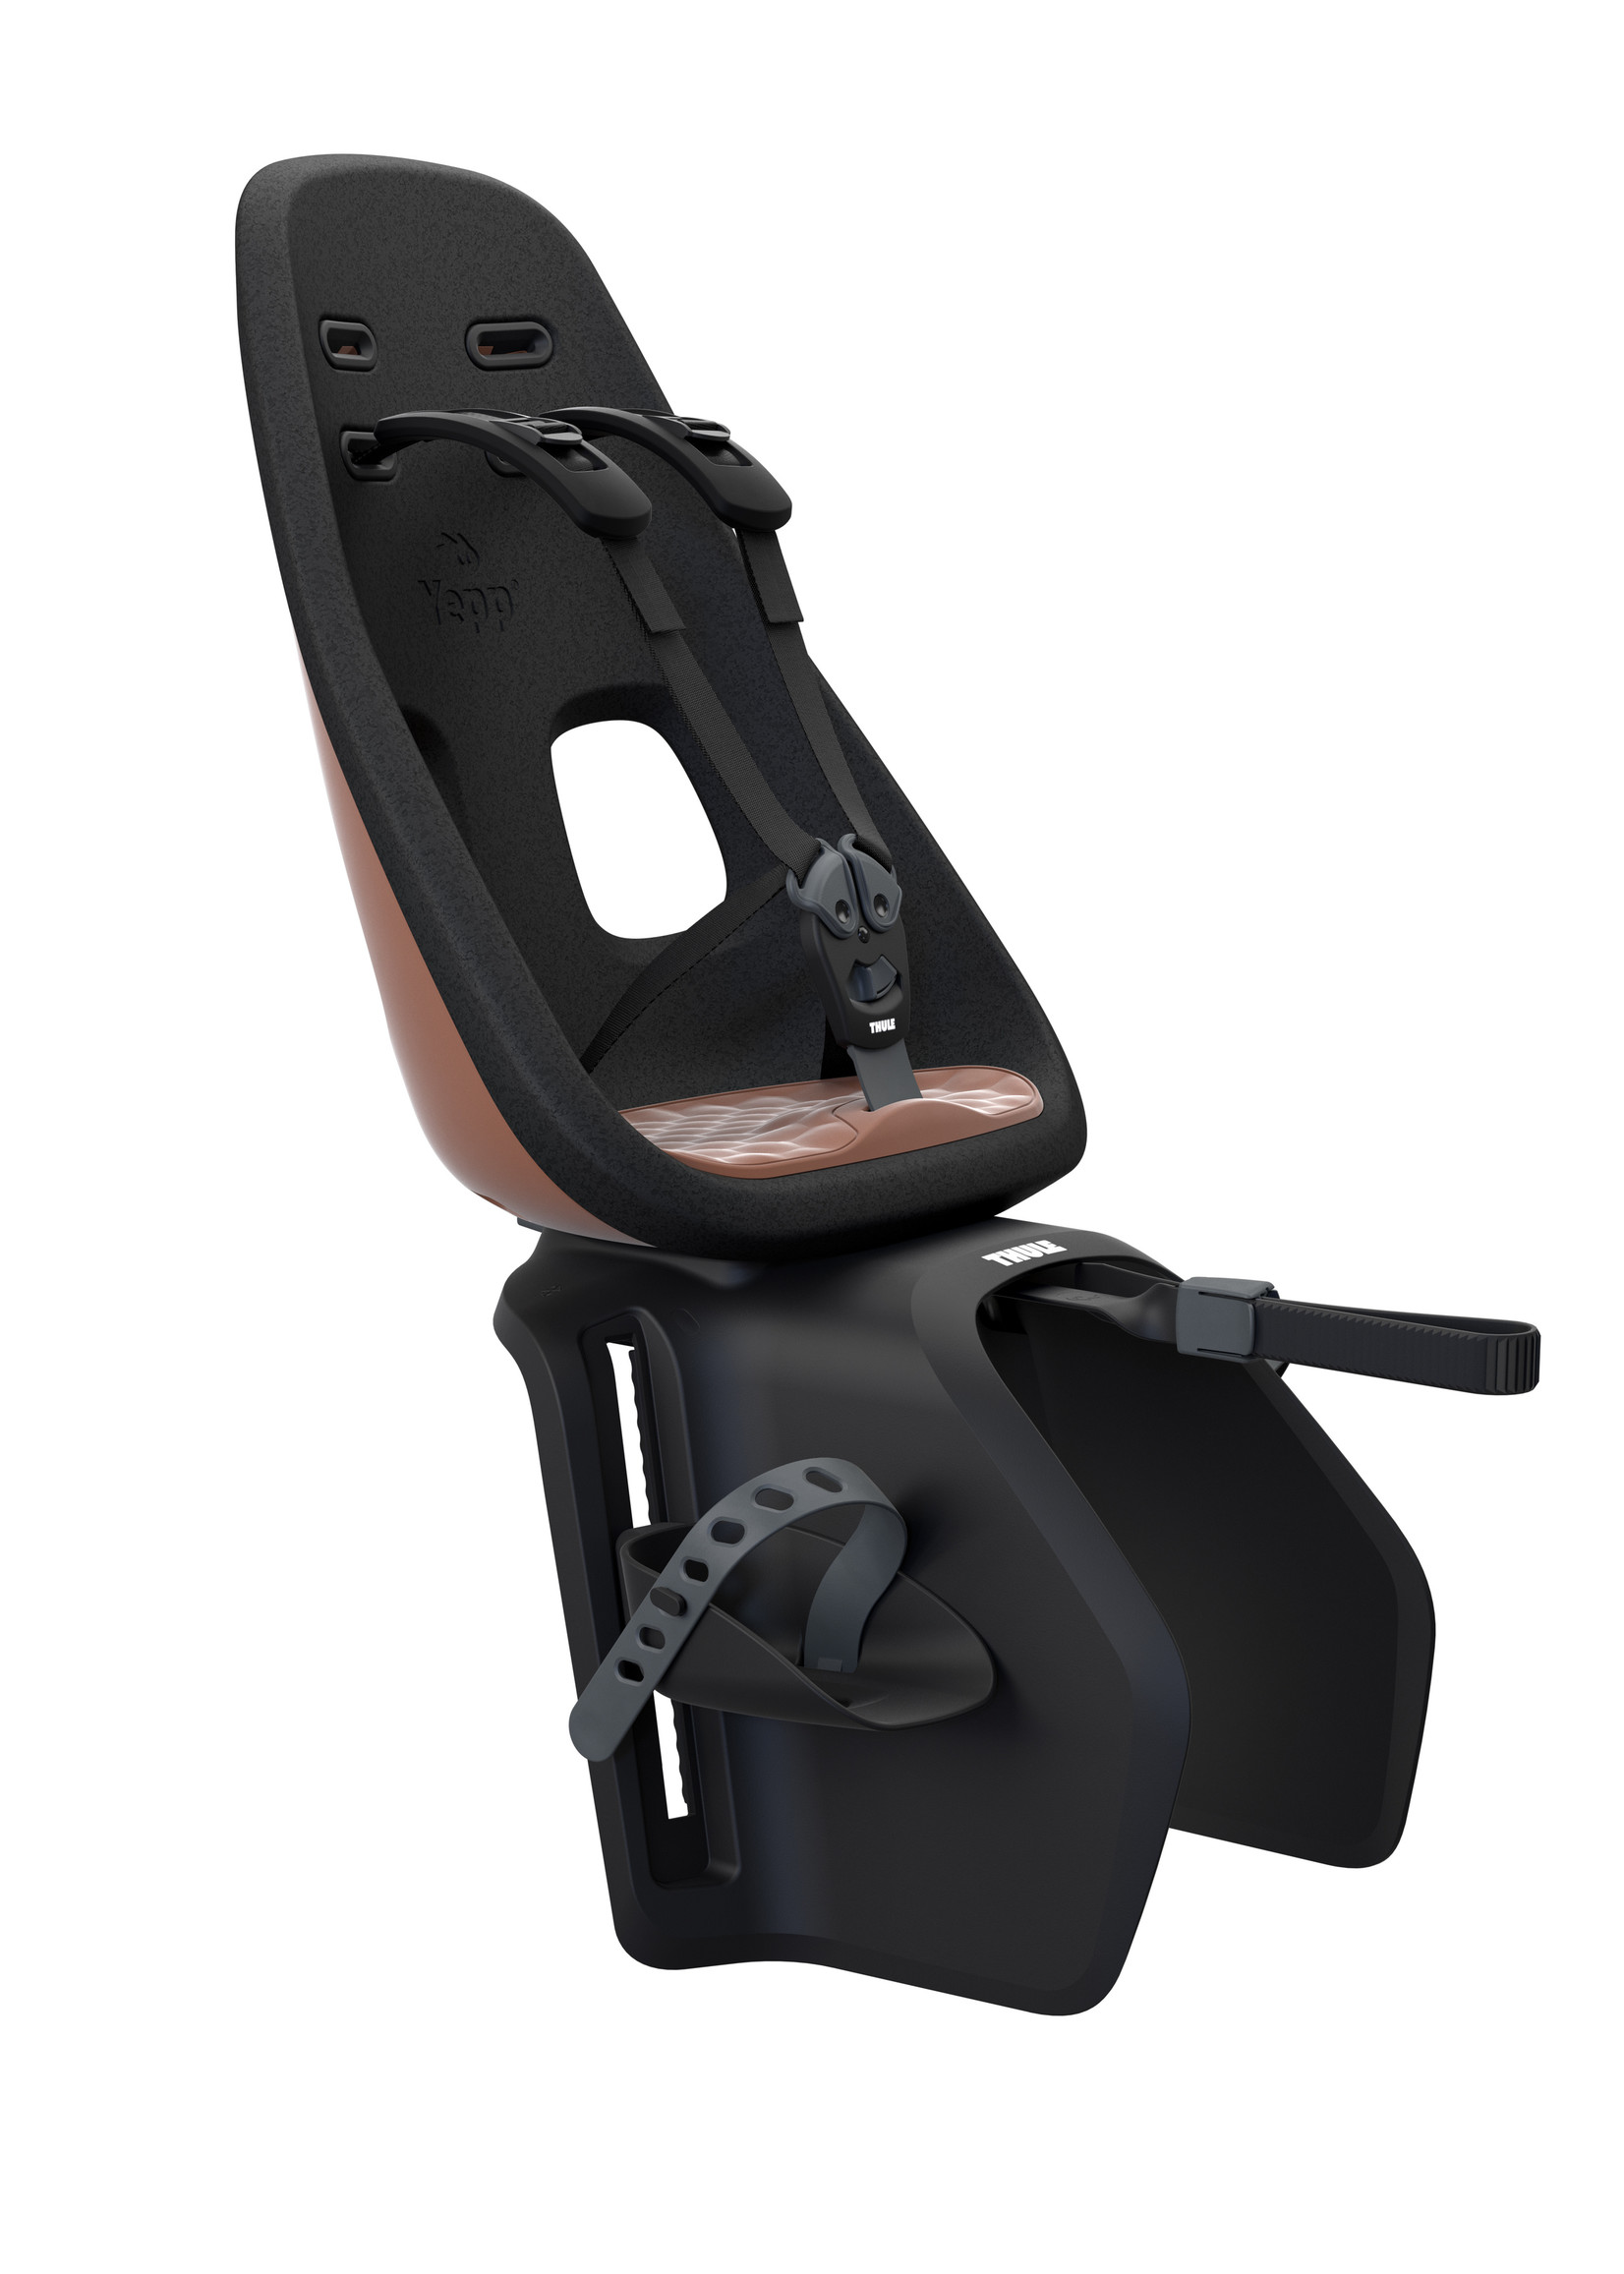 Thule Yepp Nexxt Maxi - Rack Mounted